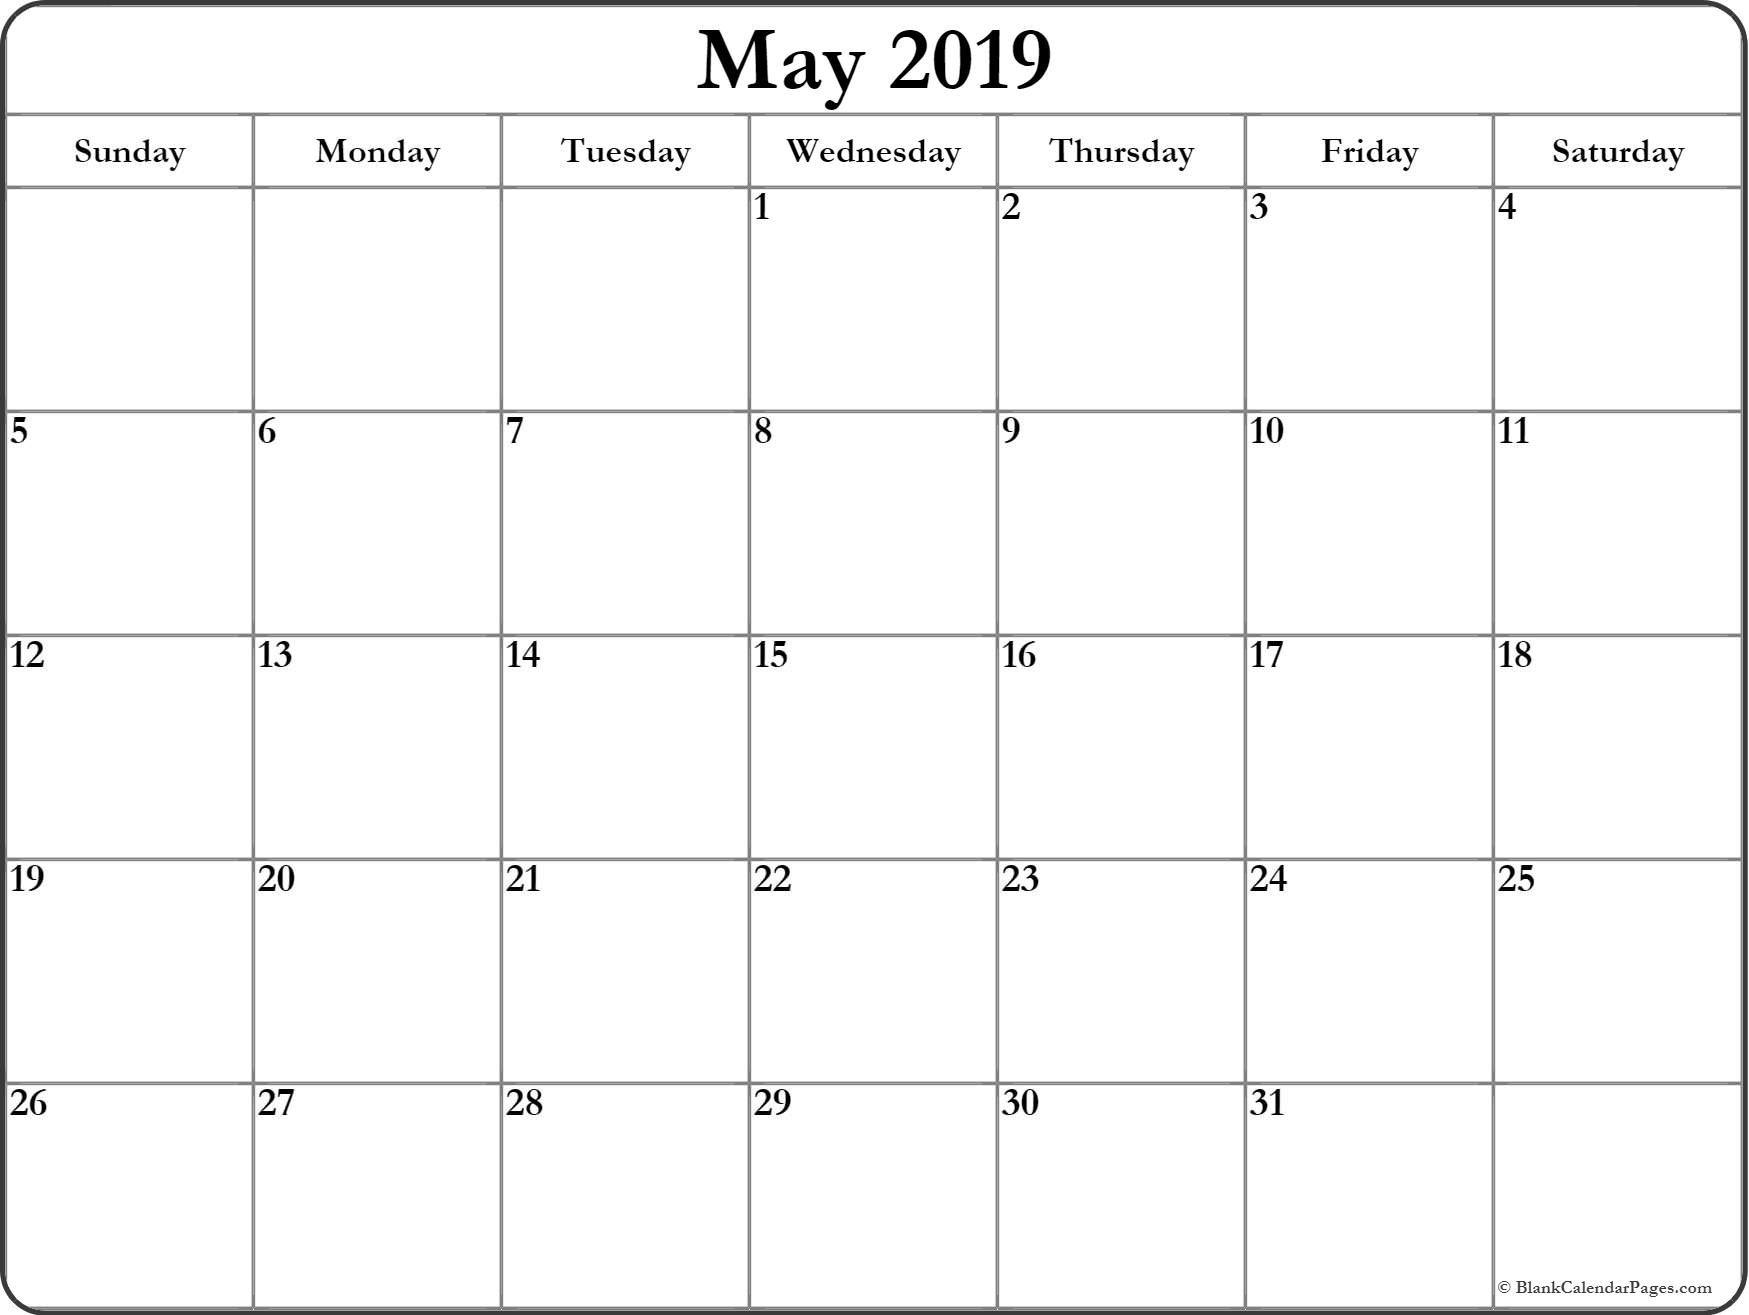 May 2019 Blank Calendar Collection. May 1 2019 Calendar